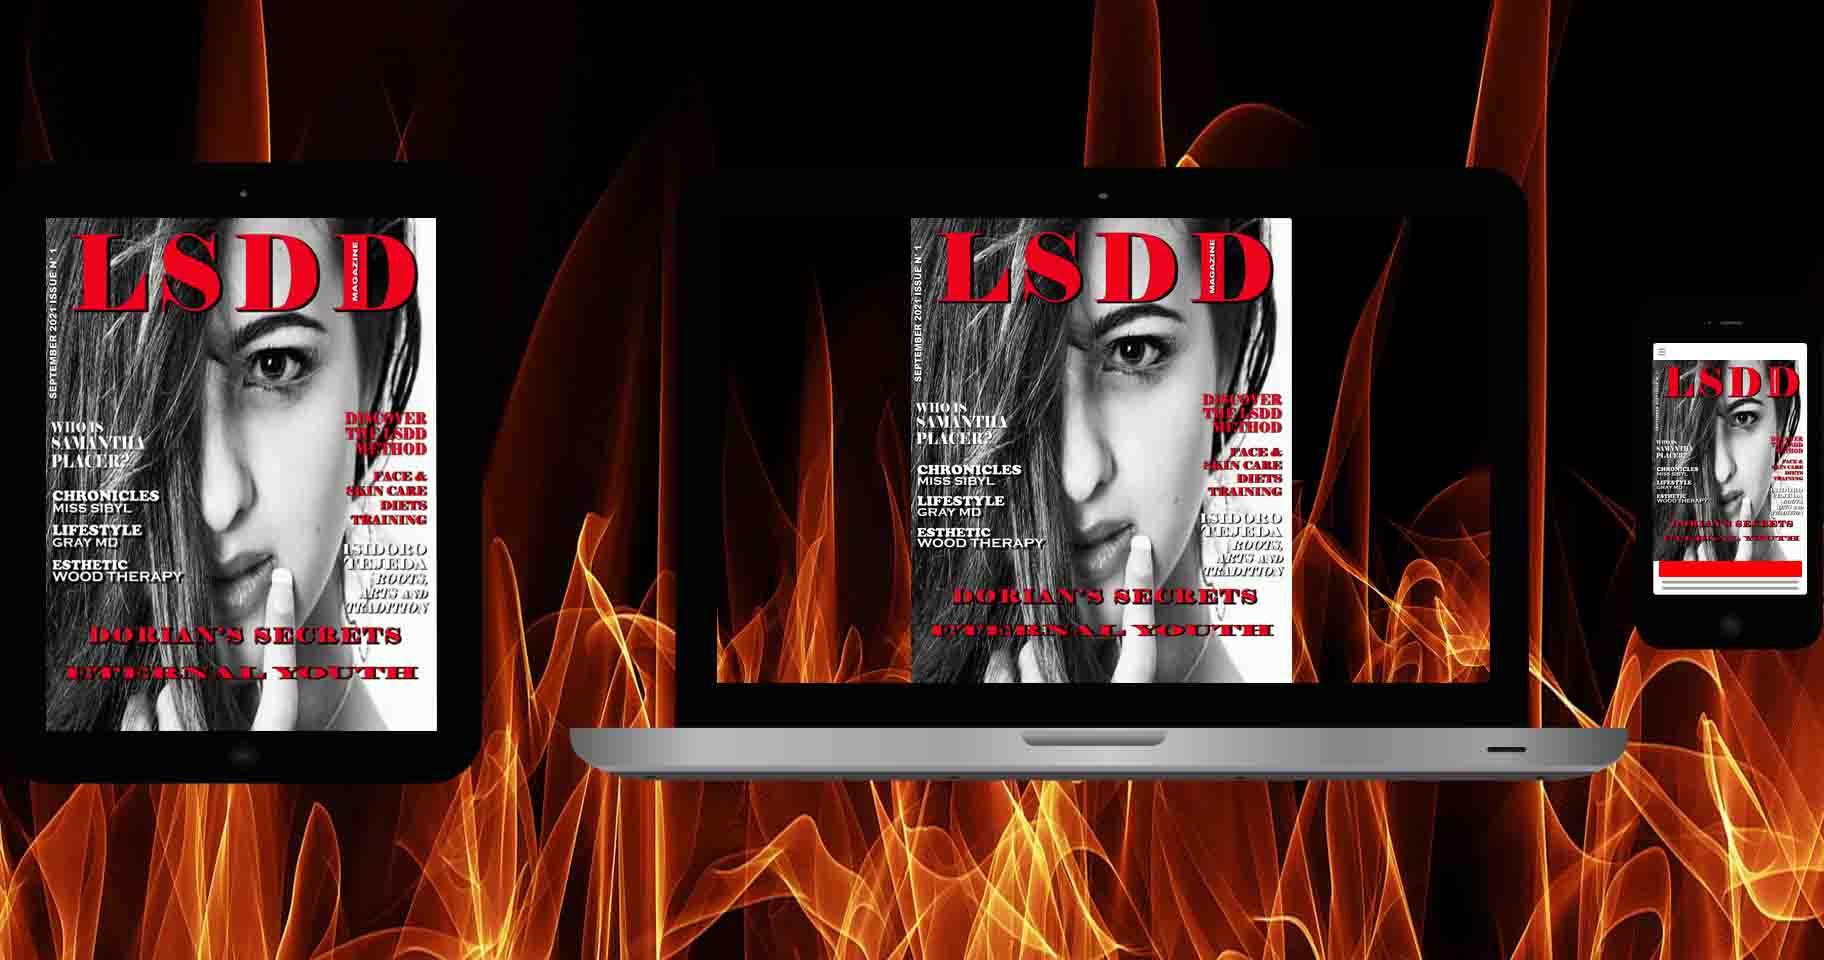 LSDD Digital Magazine Dorian's Secrets